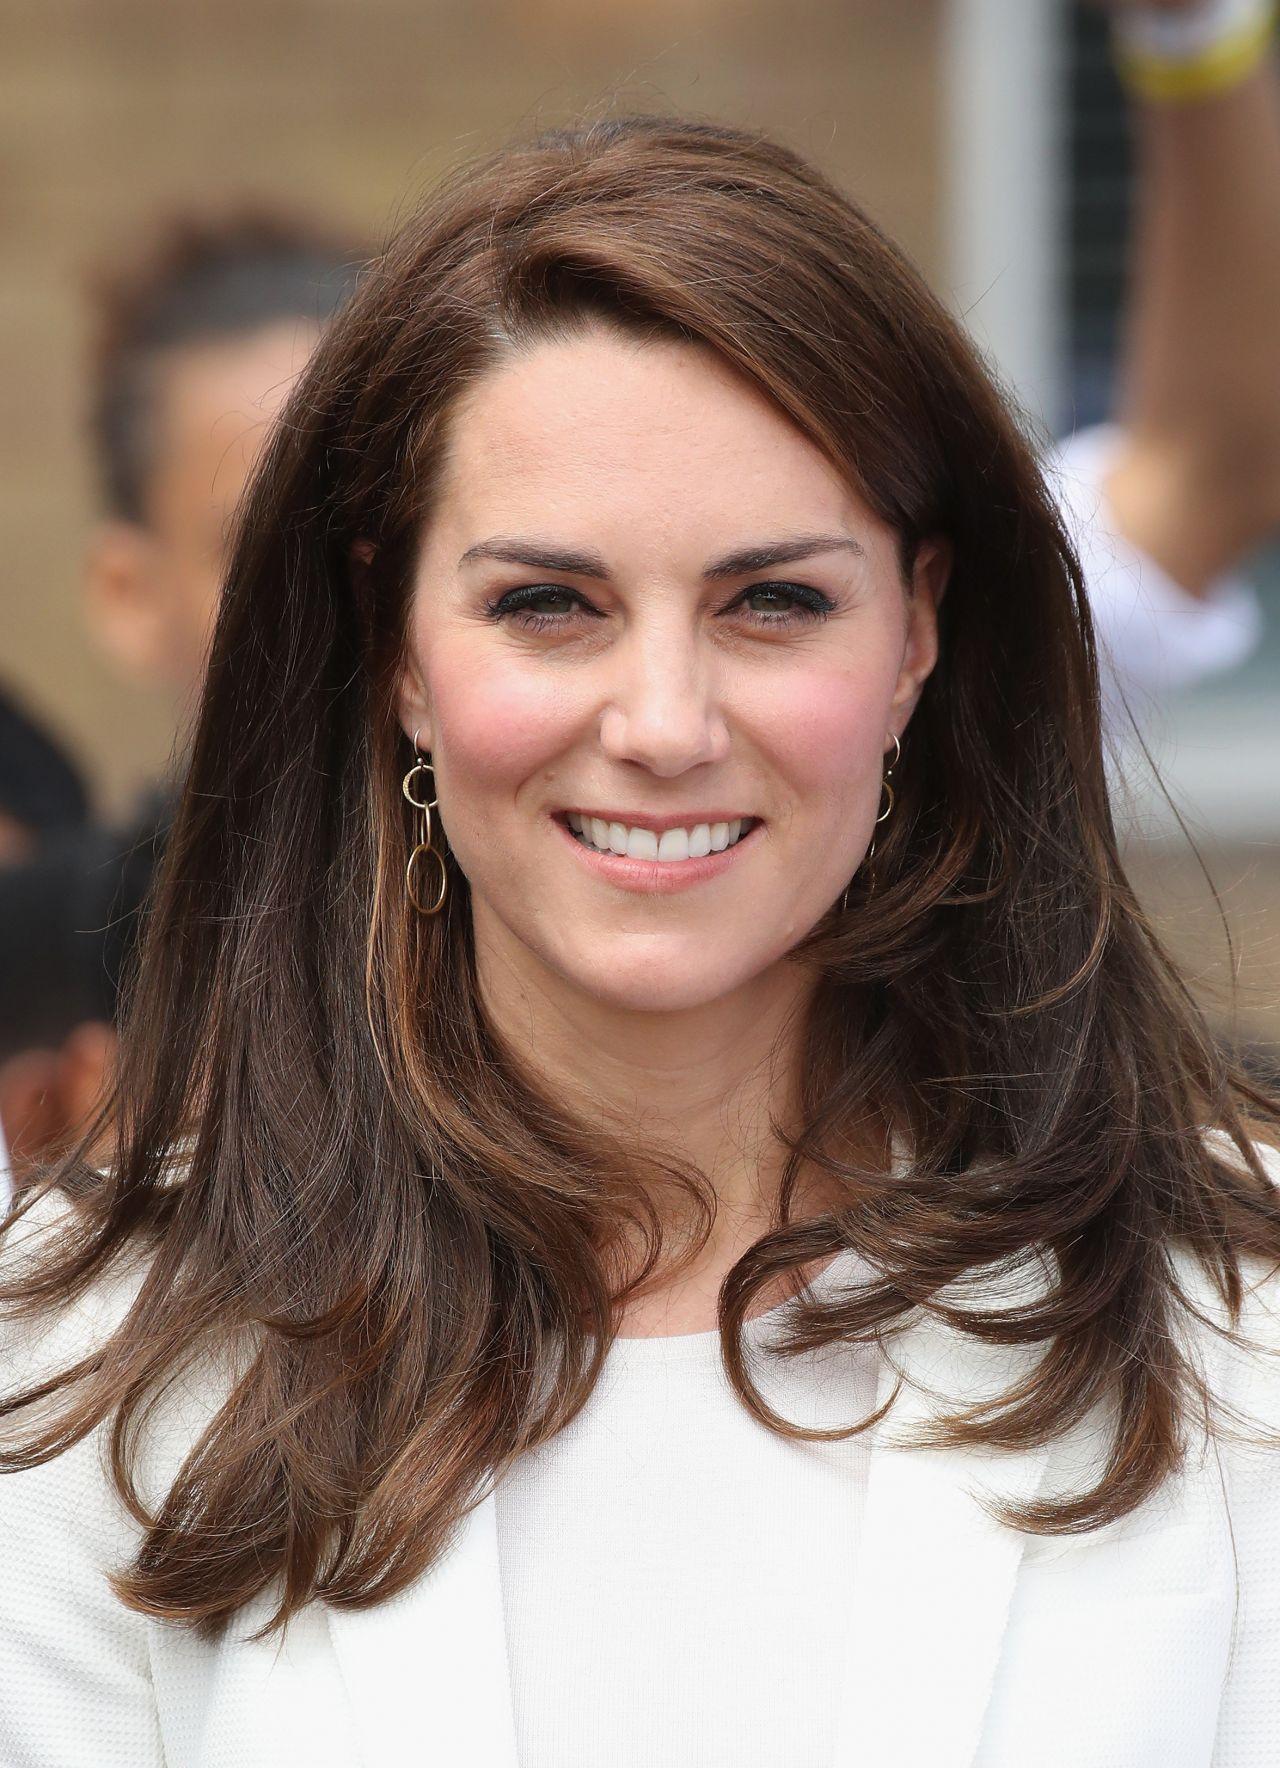 Kate Middleton's Best-Dressed Looks